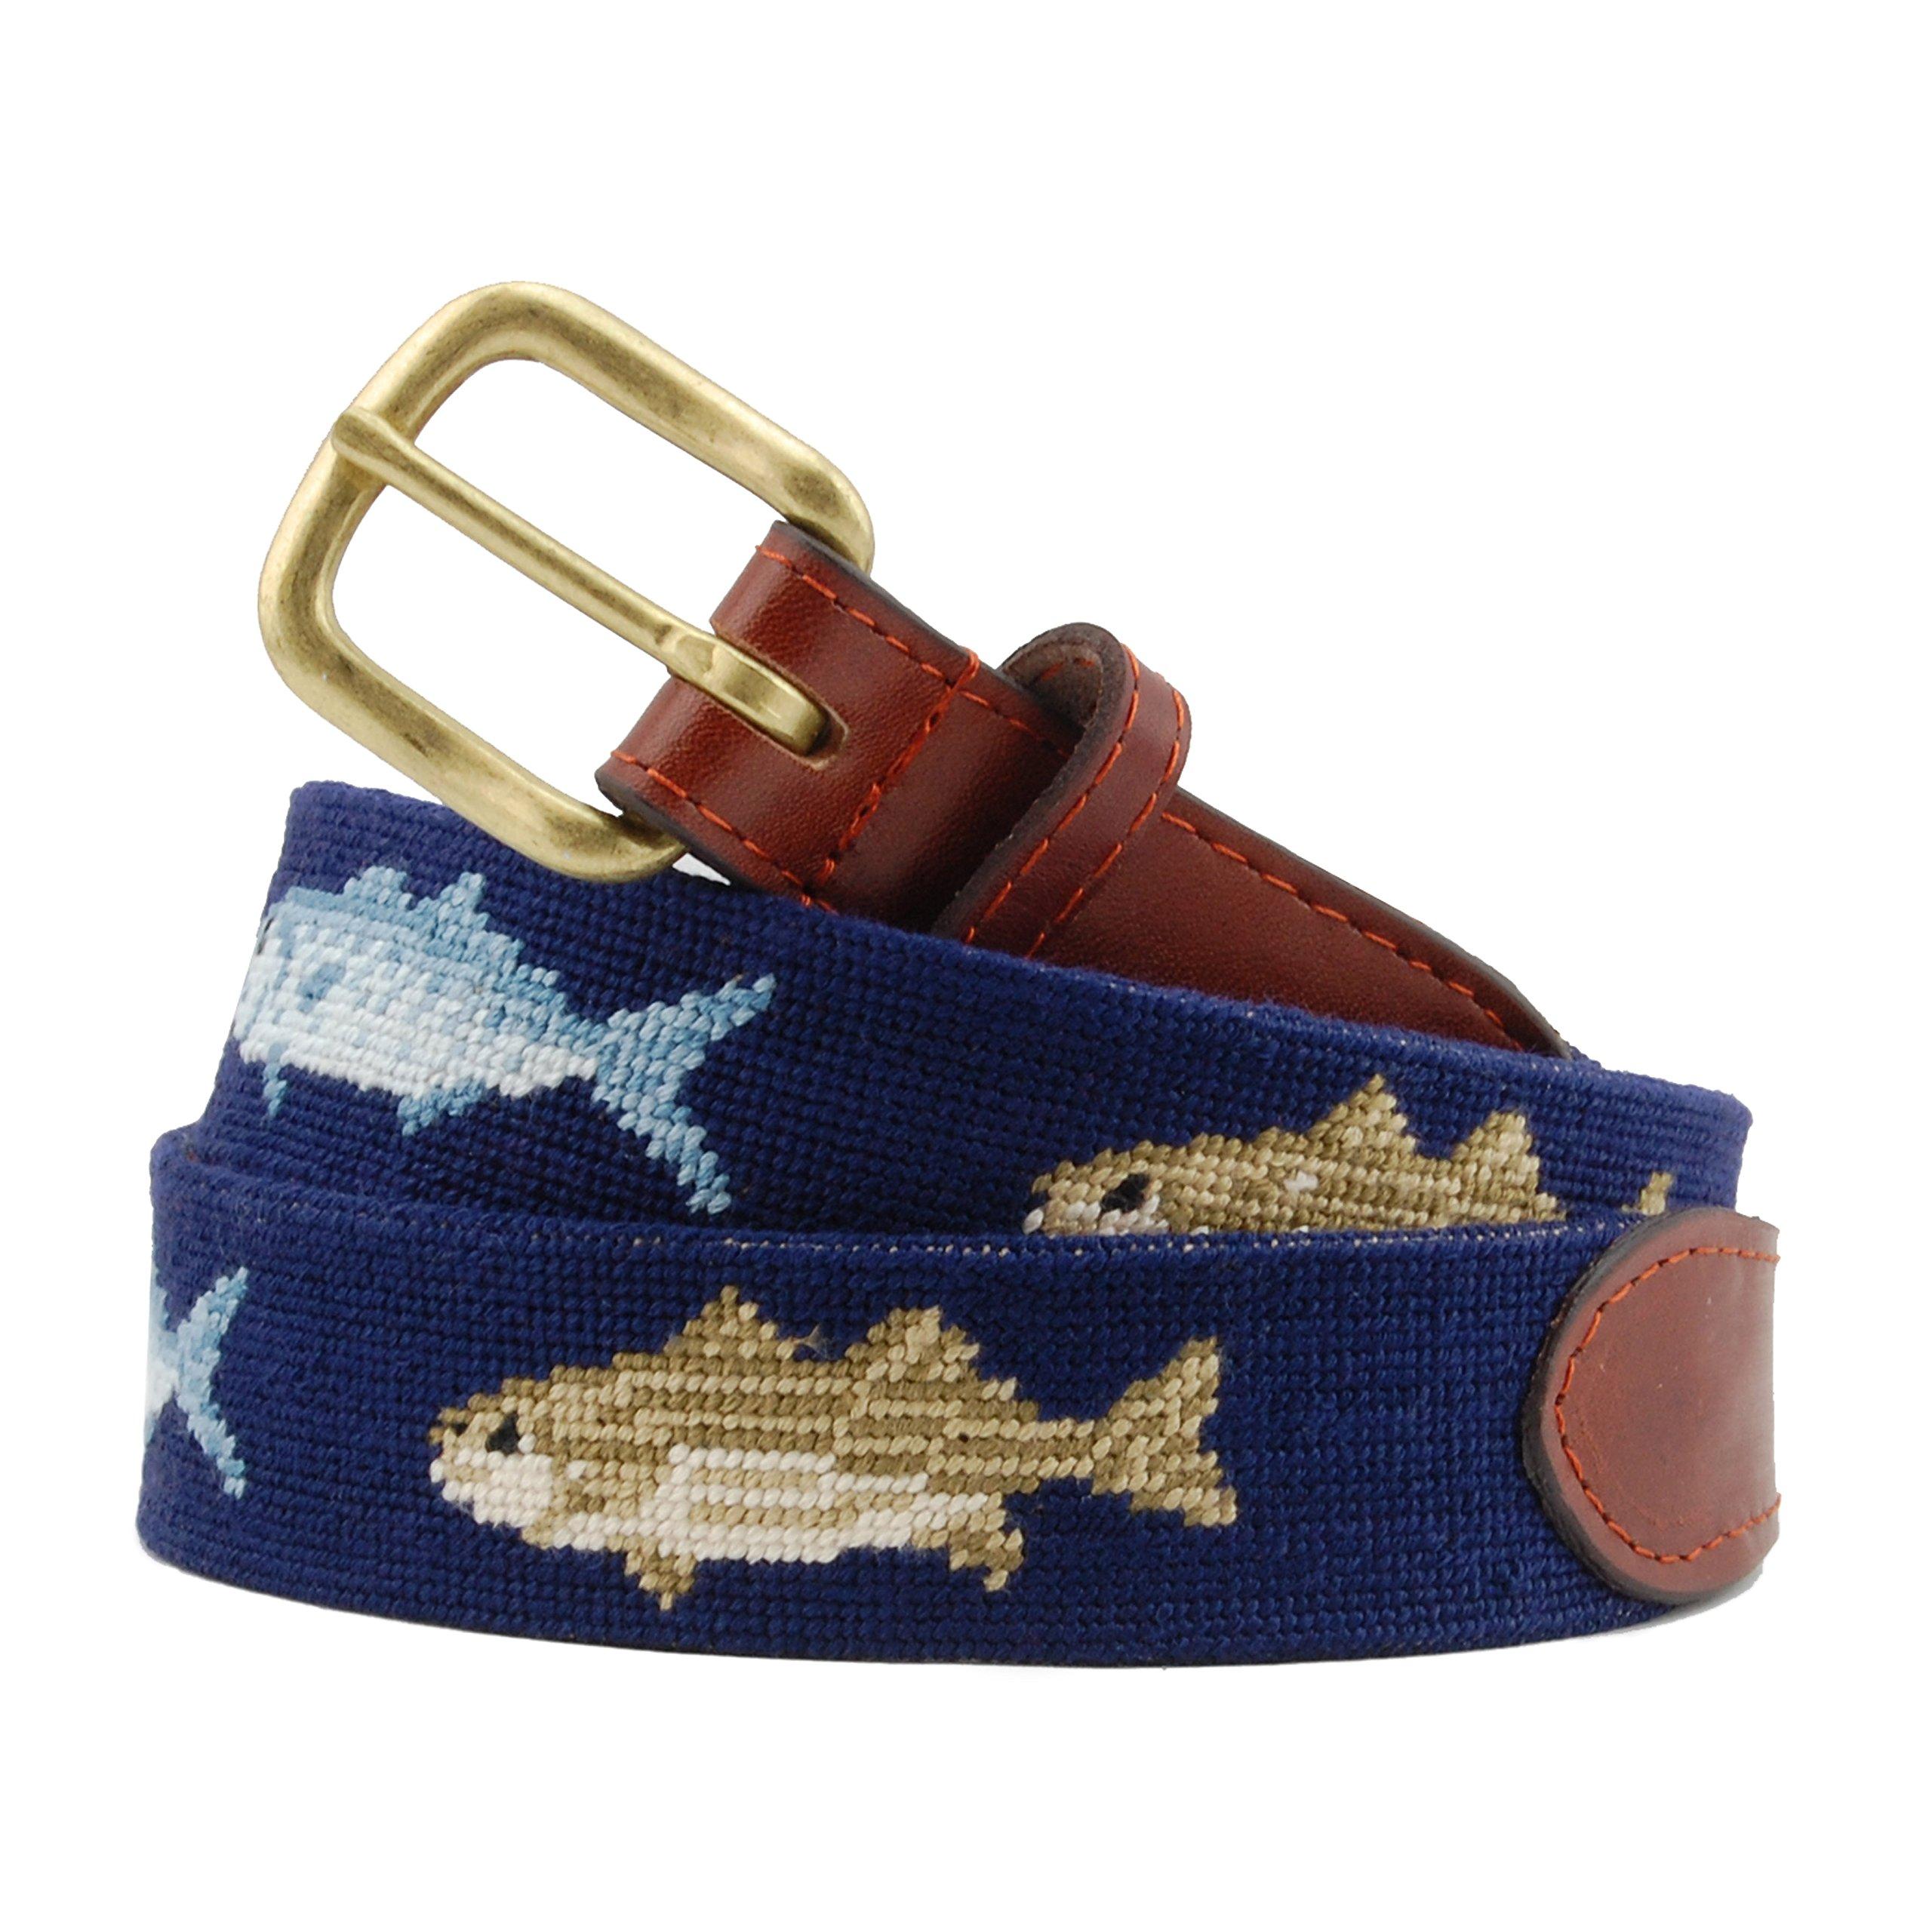 Smathers & Branson Men's Bluefish and Striper Needlepoint Belt 38 Dark Navy